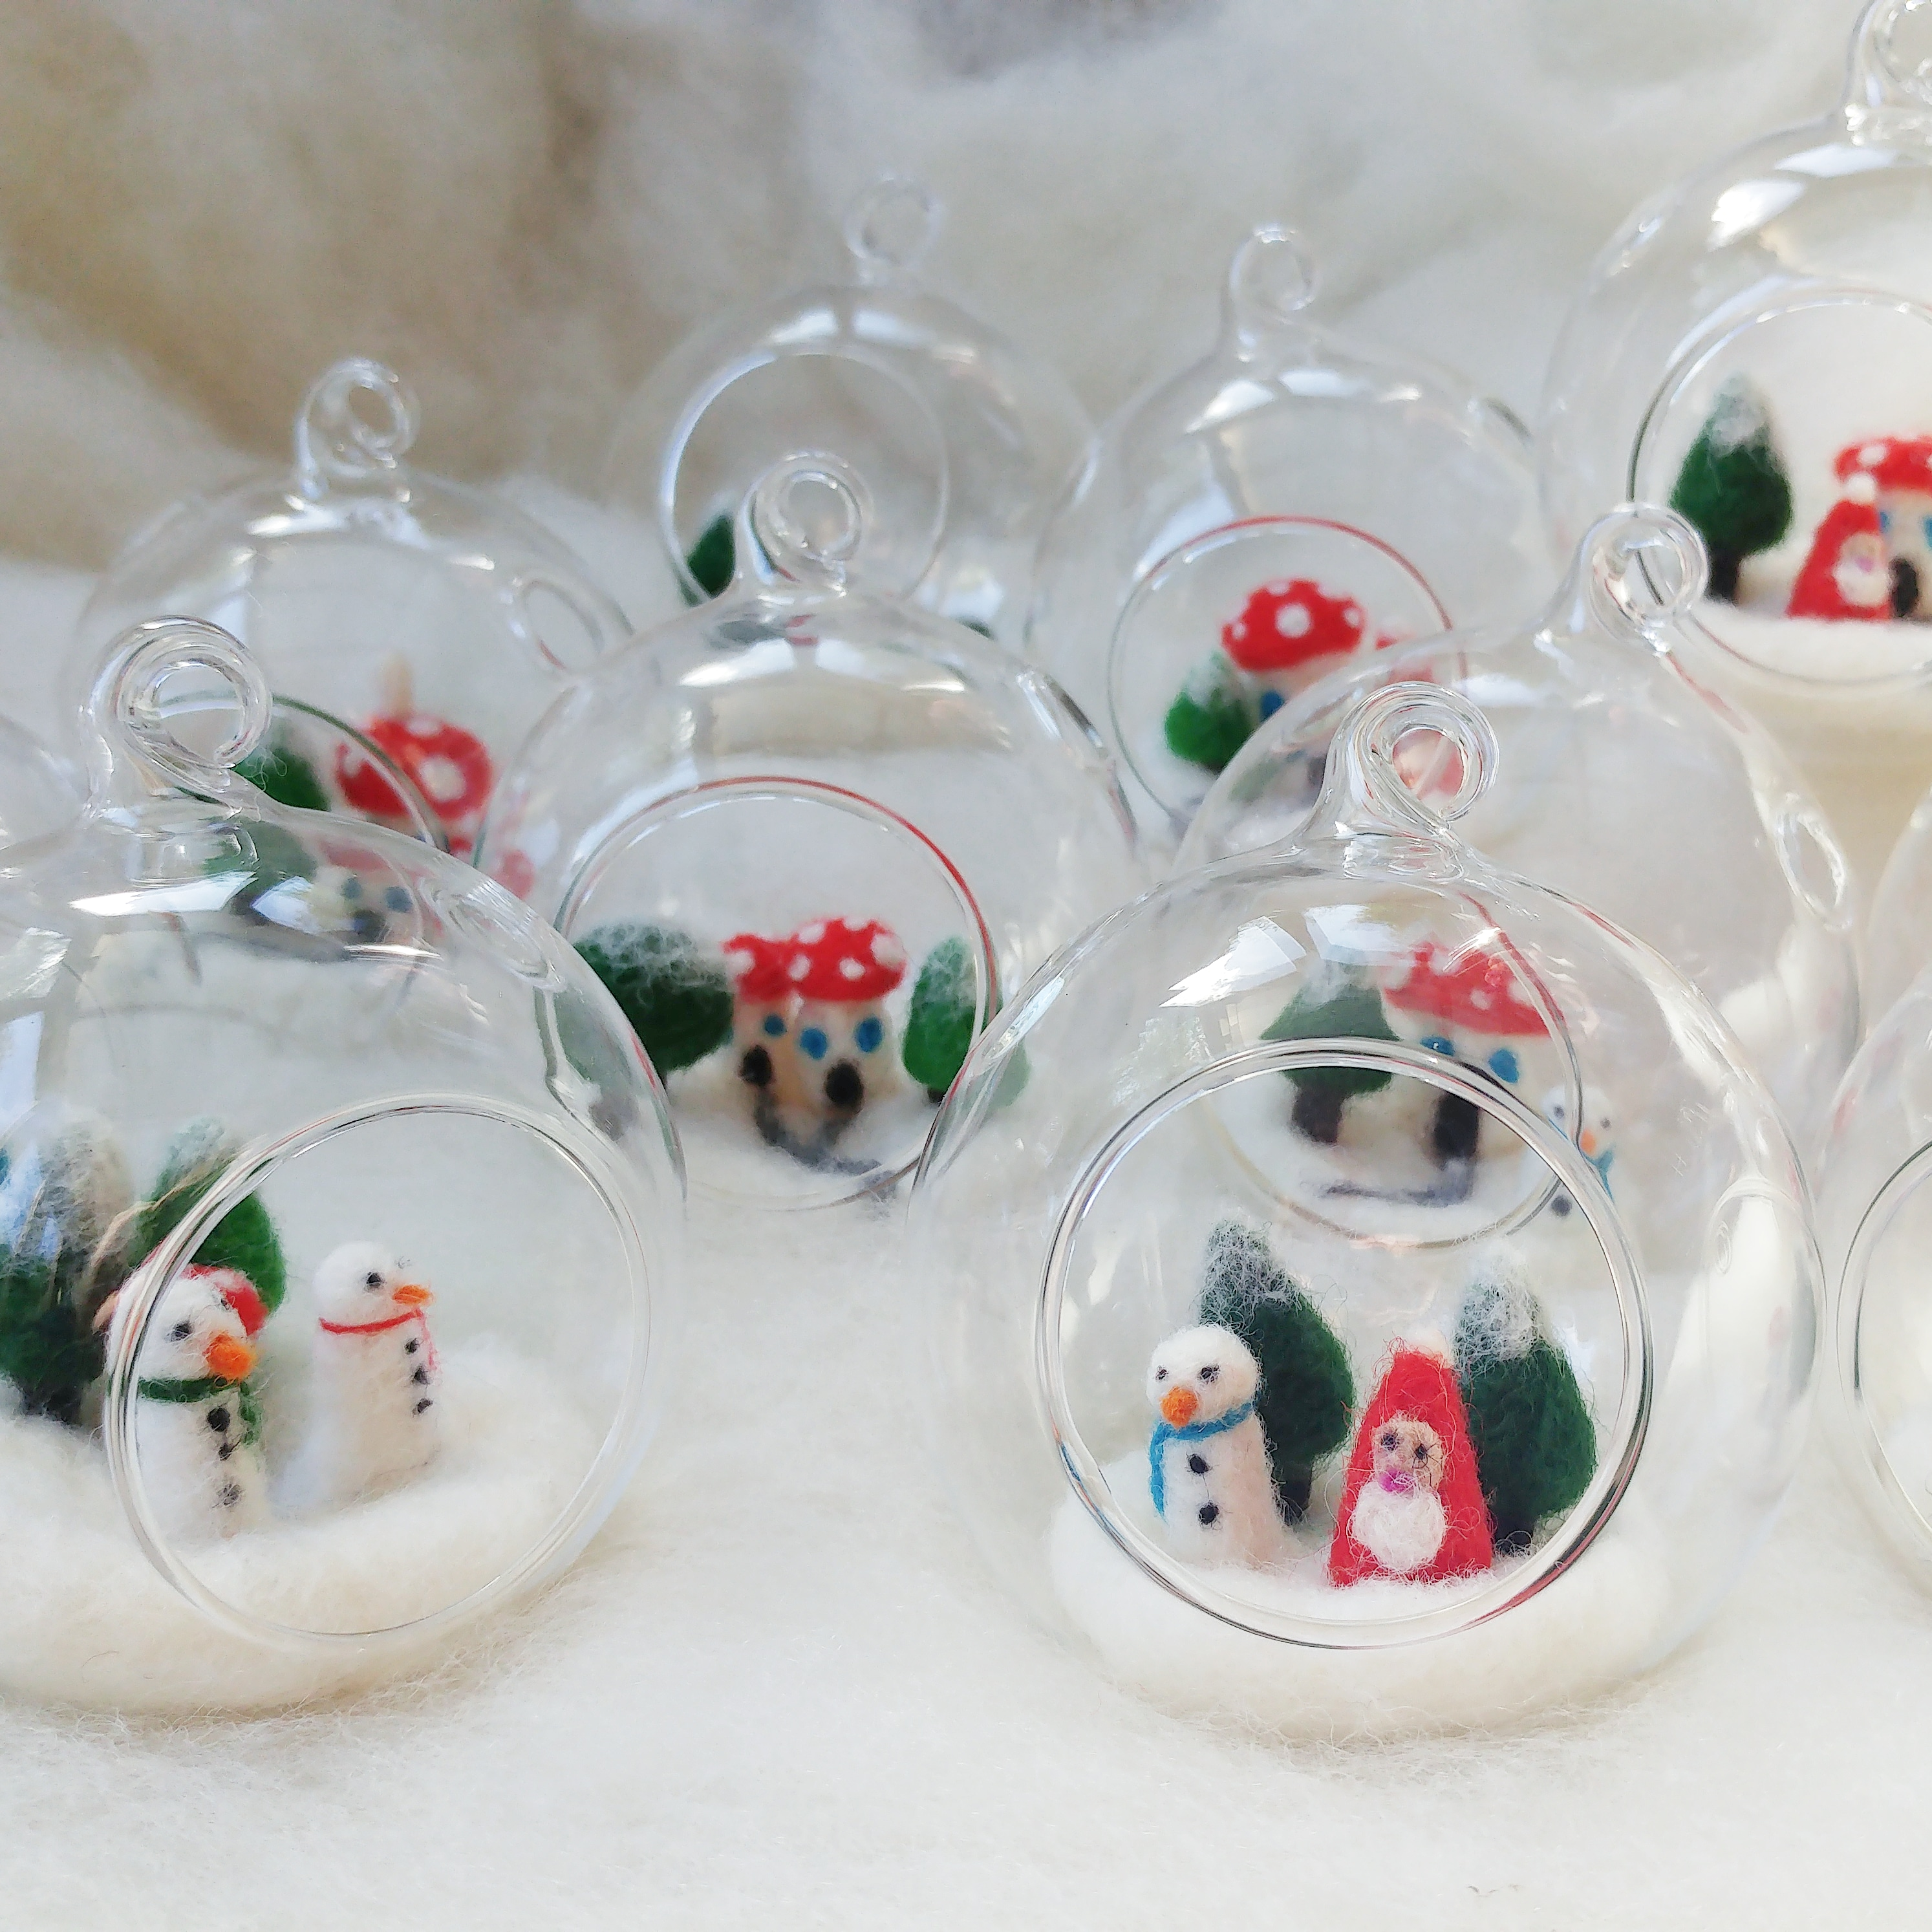 Felt Toadstool House Christmas Scene